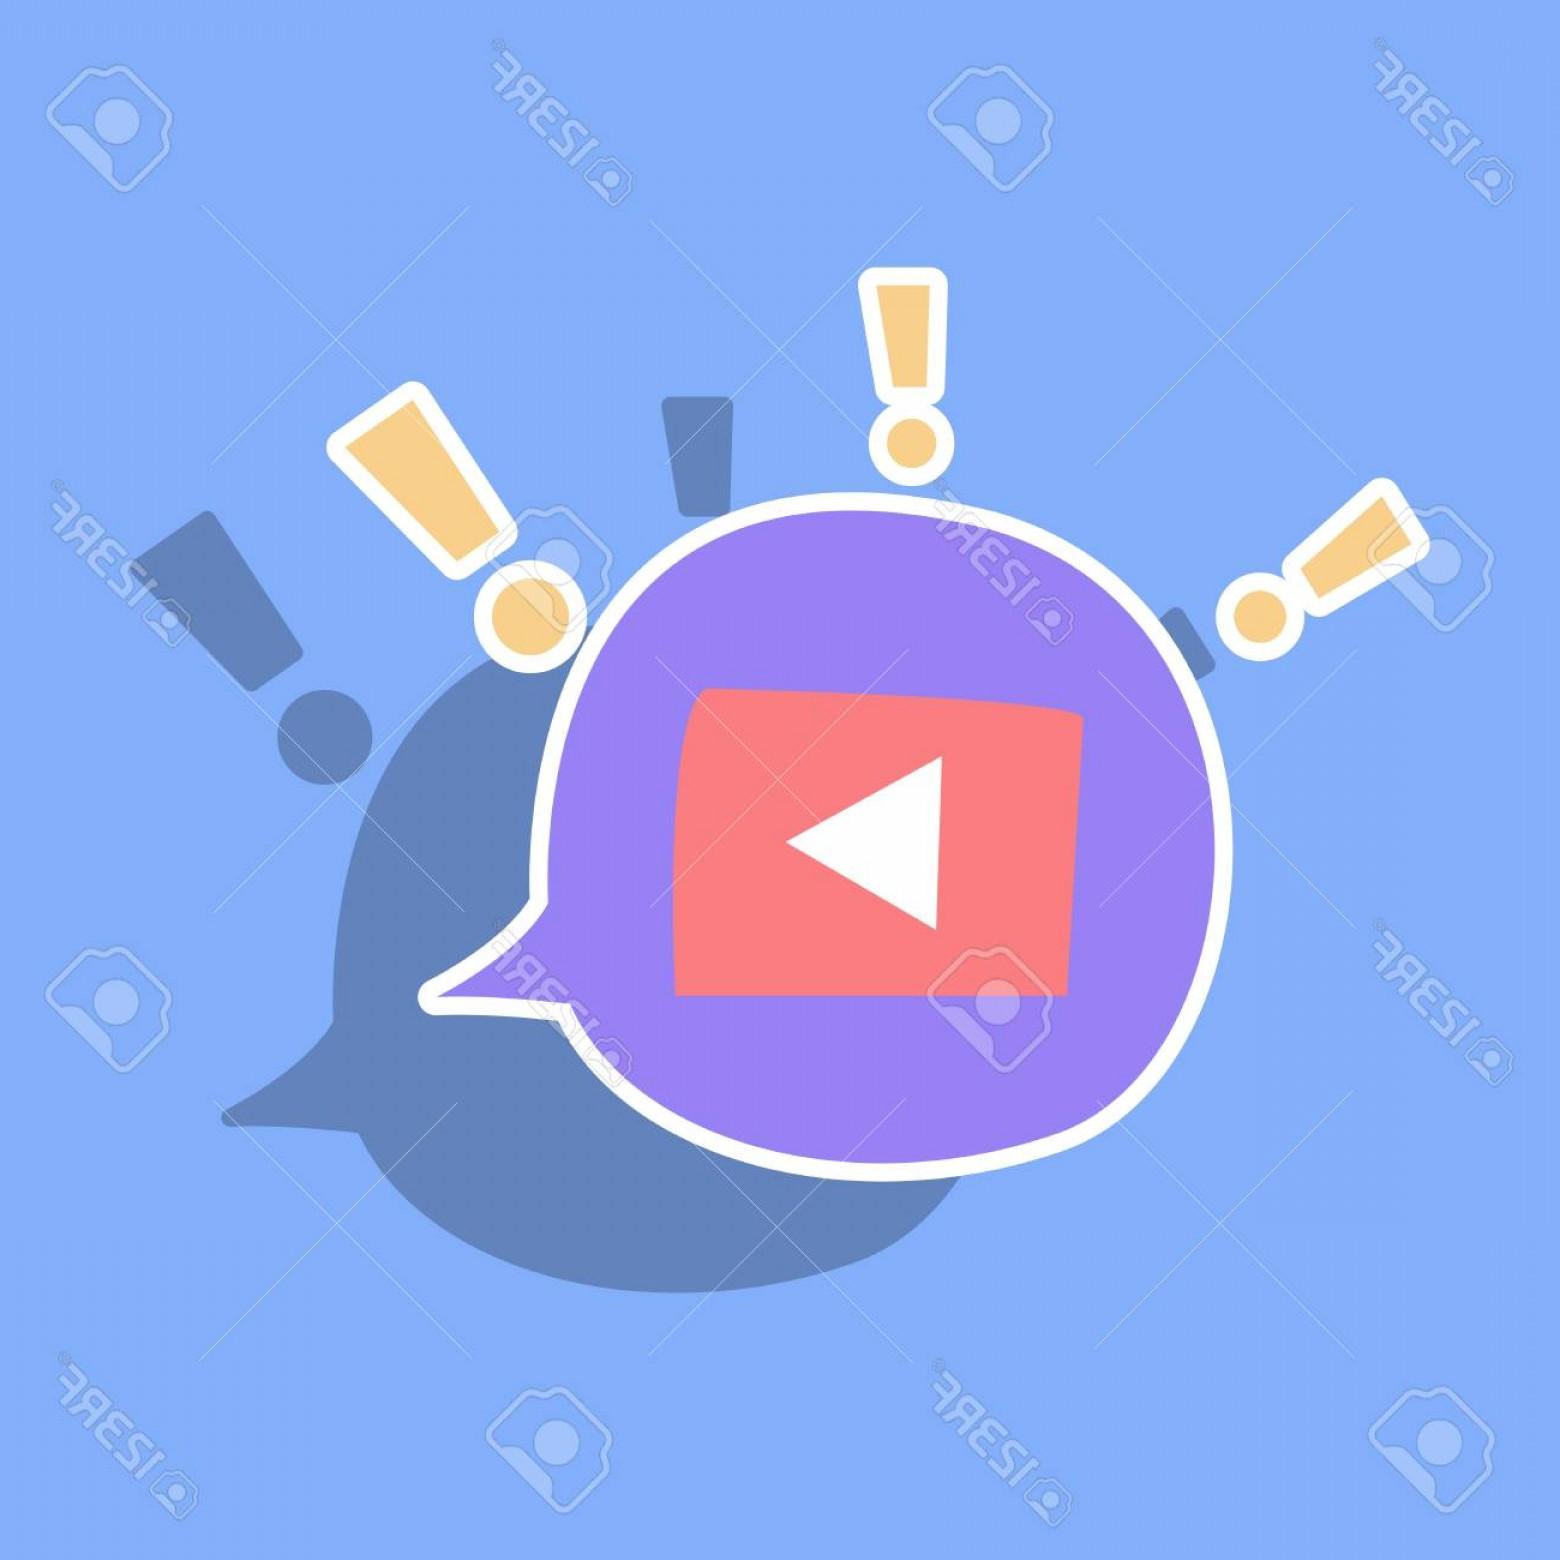 1560x1560 Youtube Logo Icon Vector Arenawp